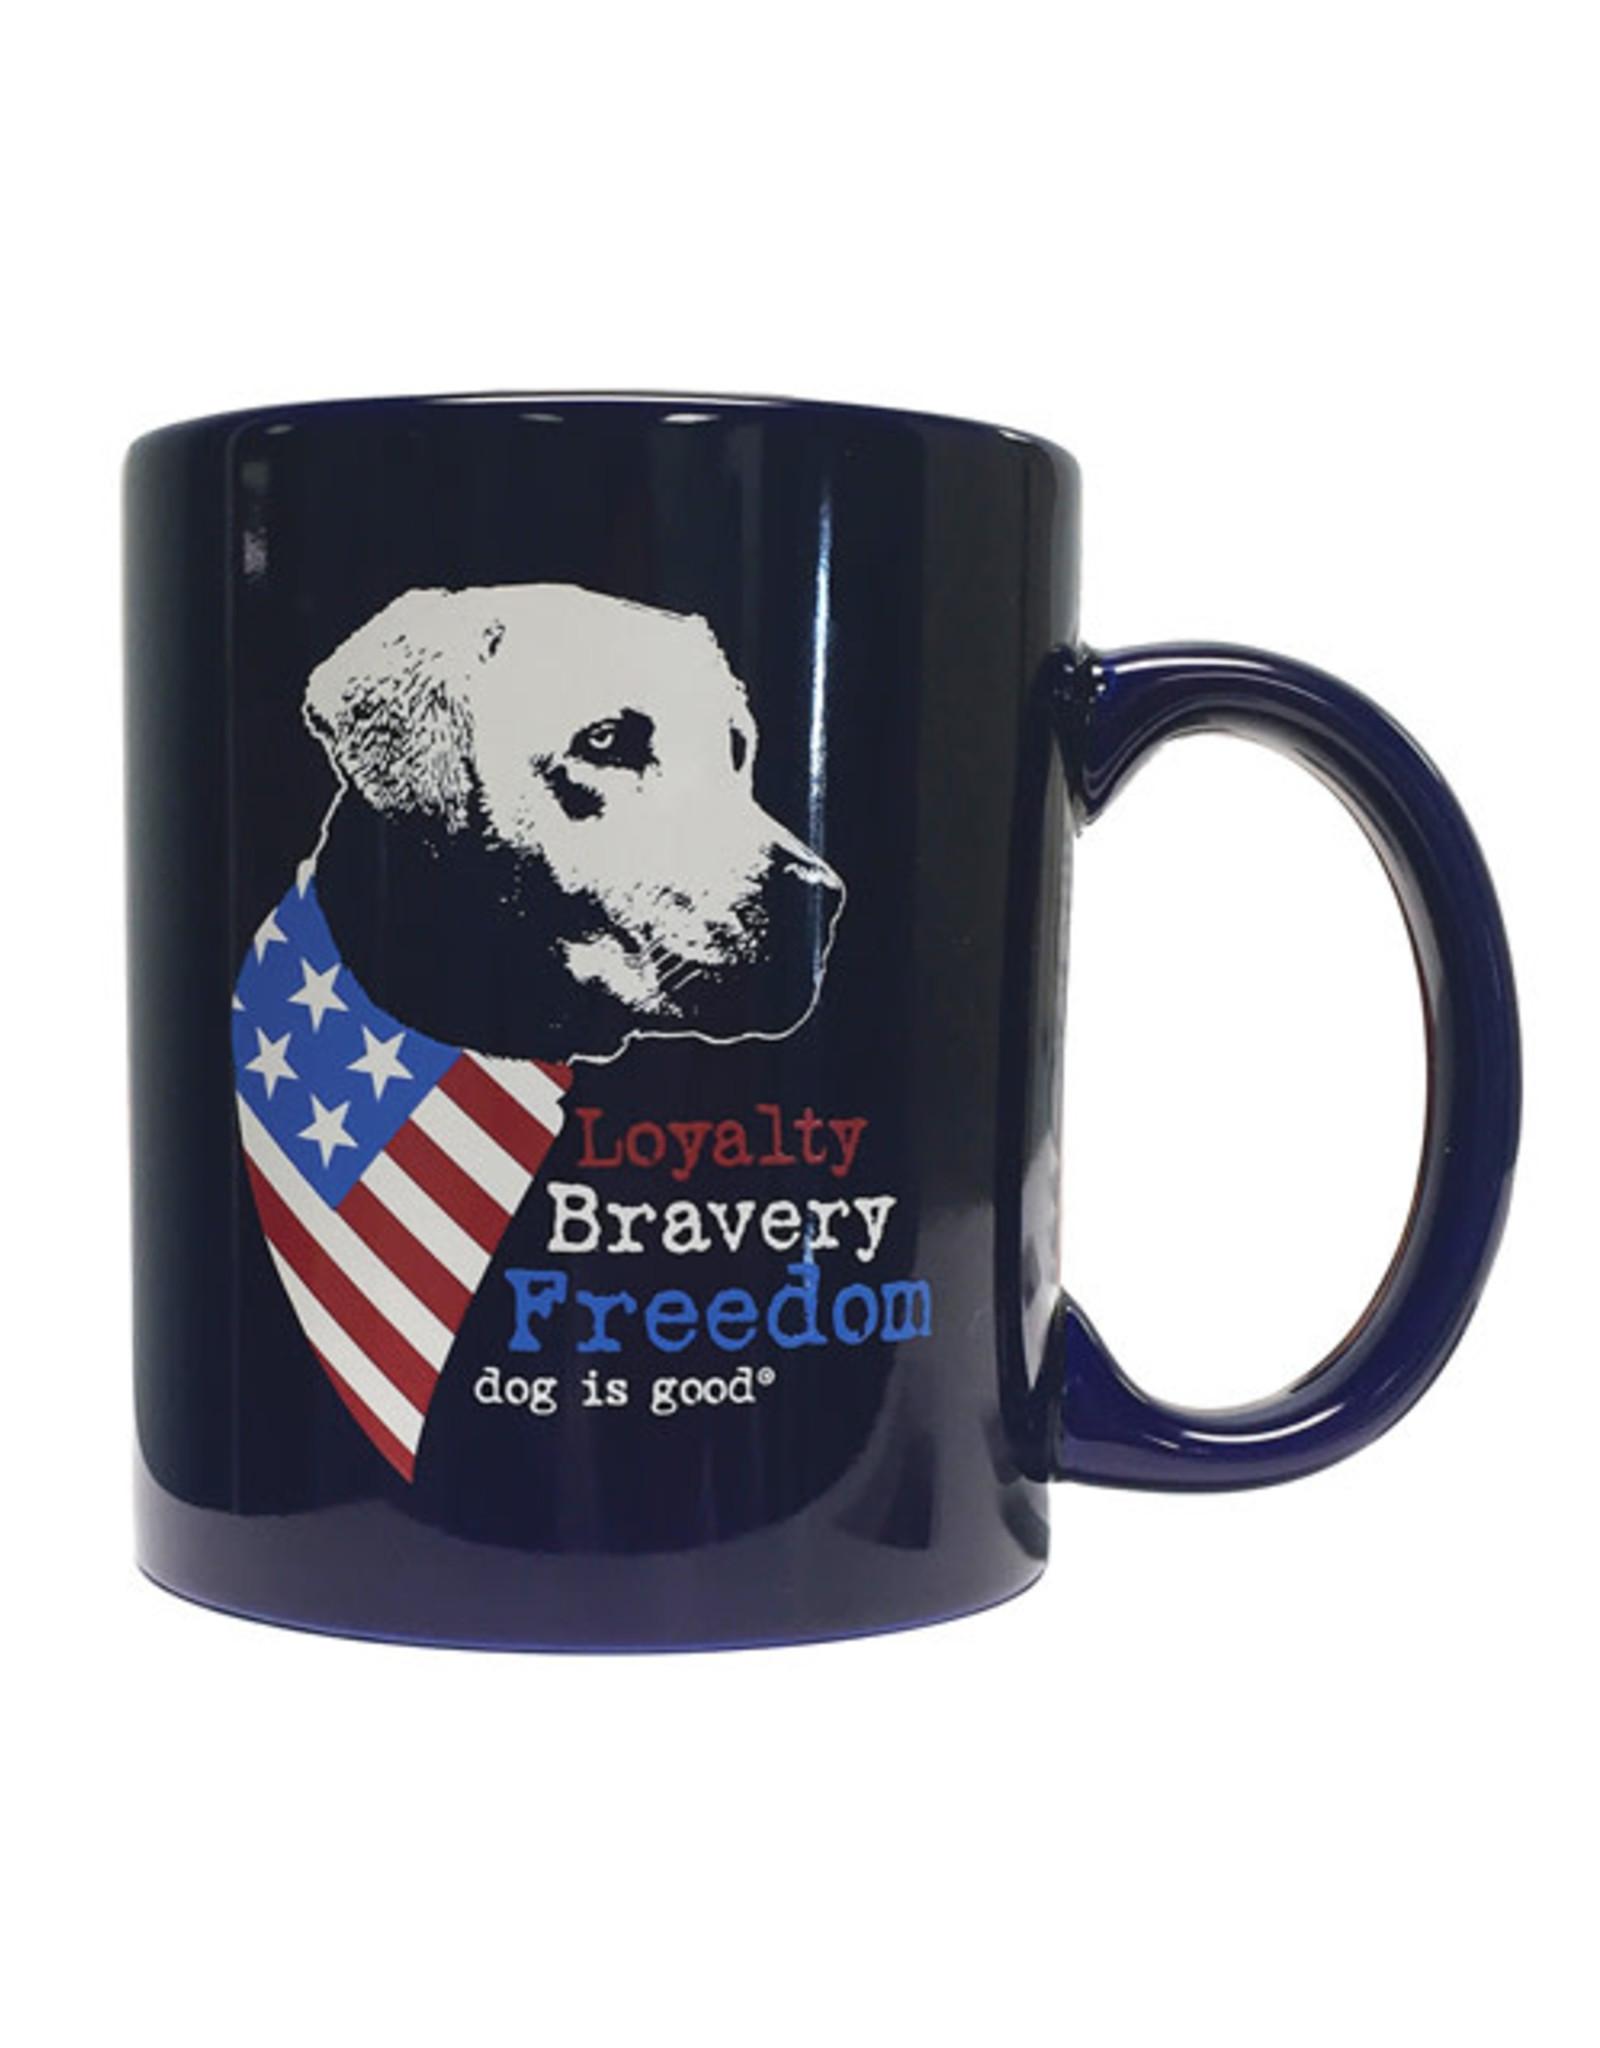 Dog Is Good Dog is Good Mug - Freedom Dog